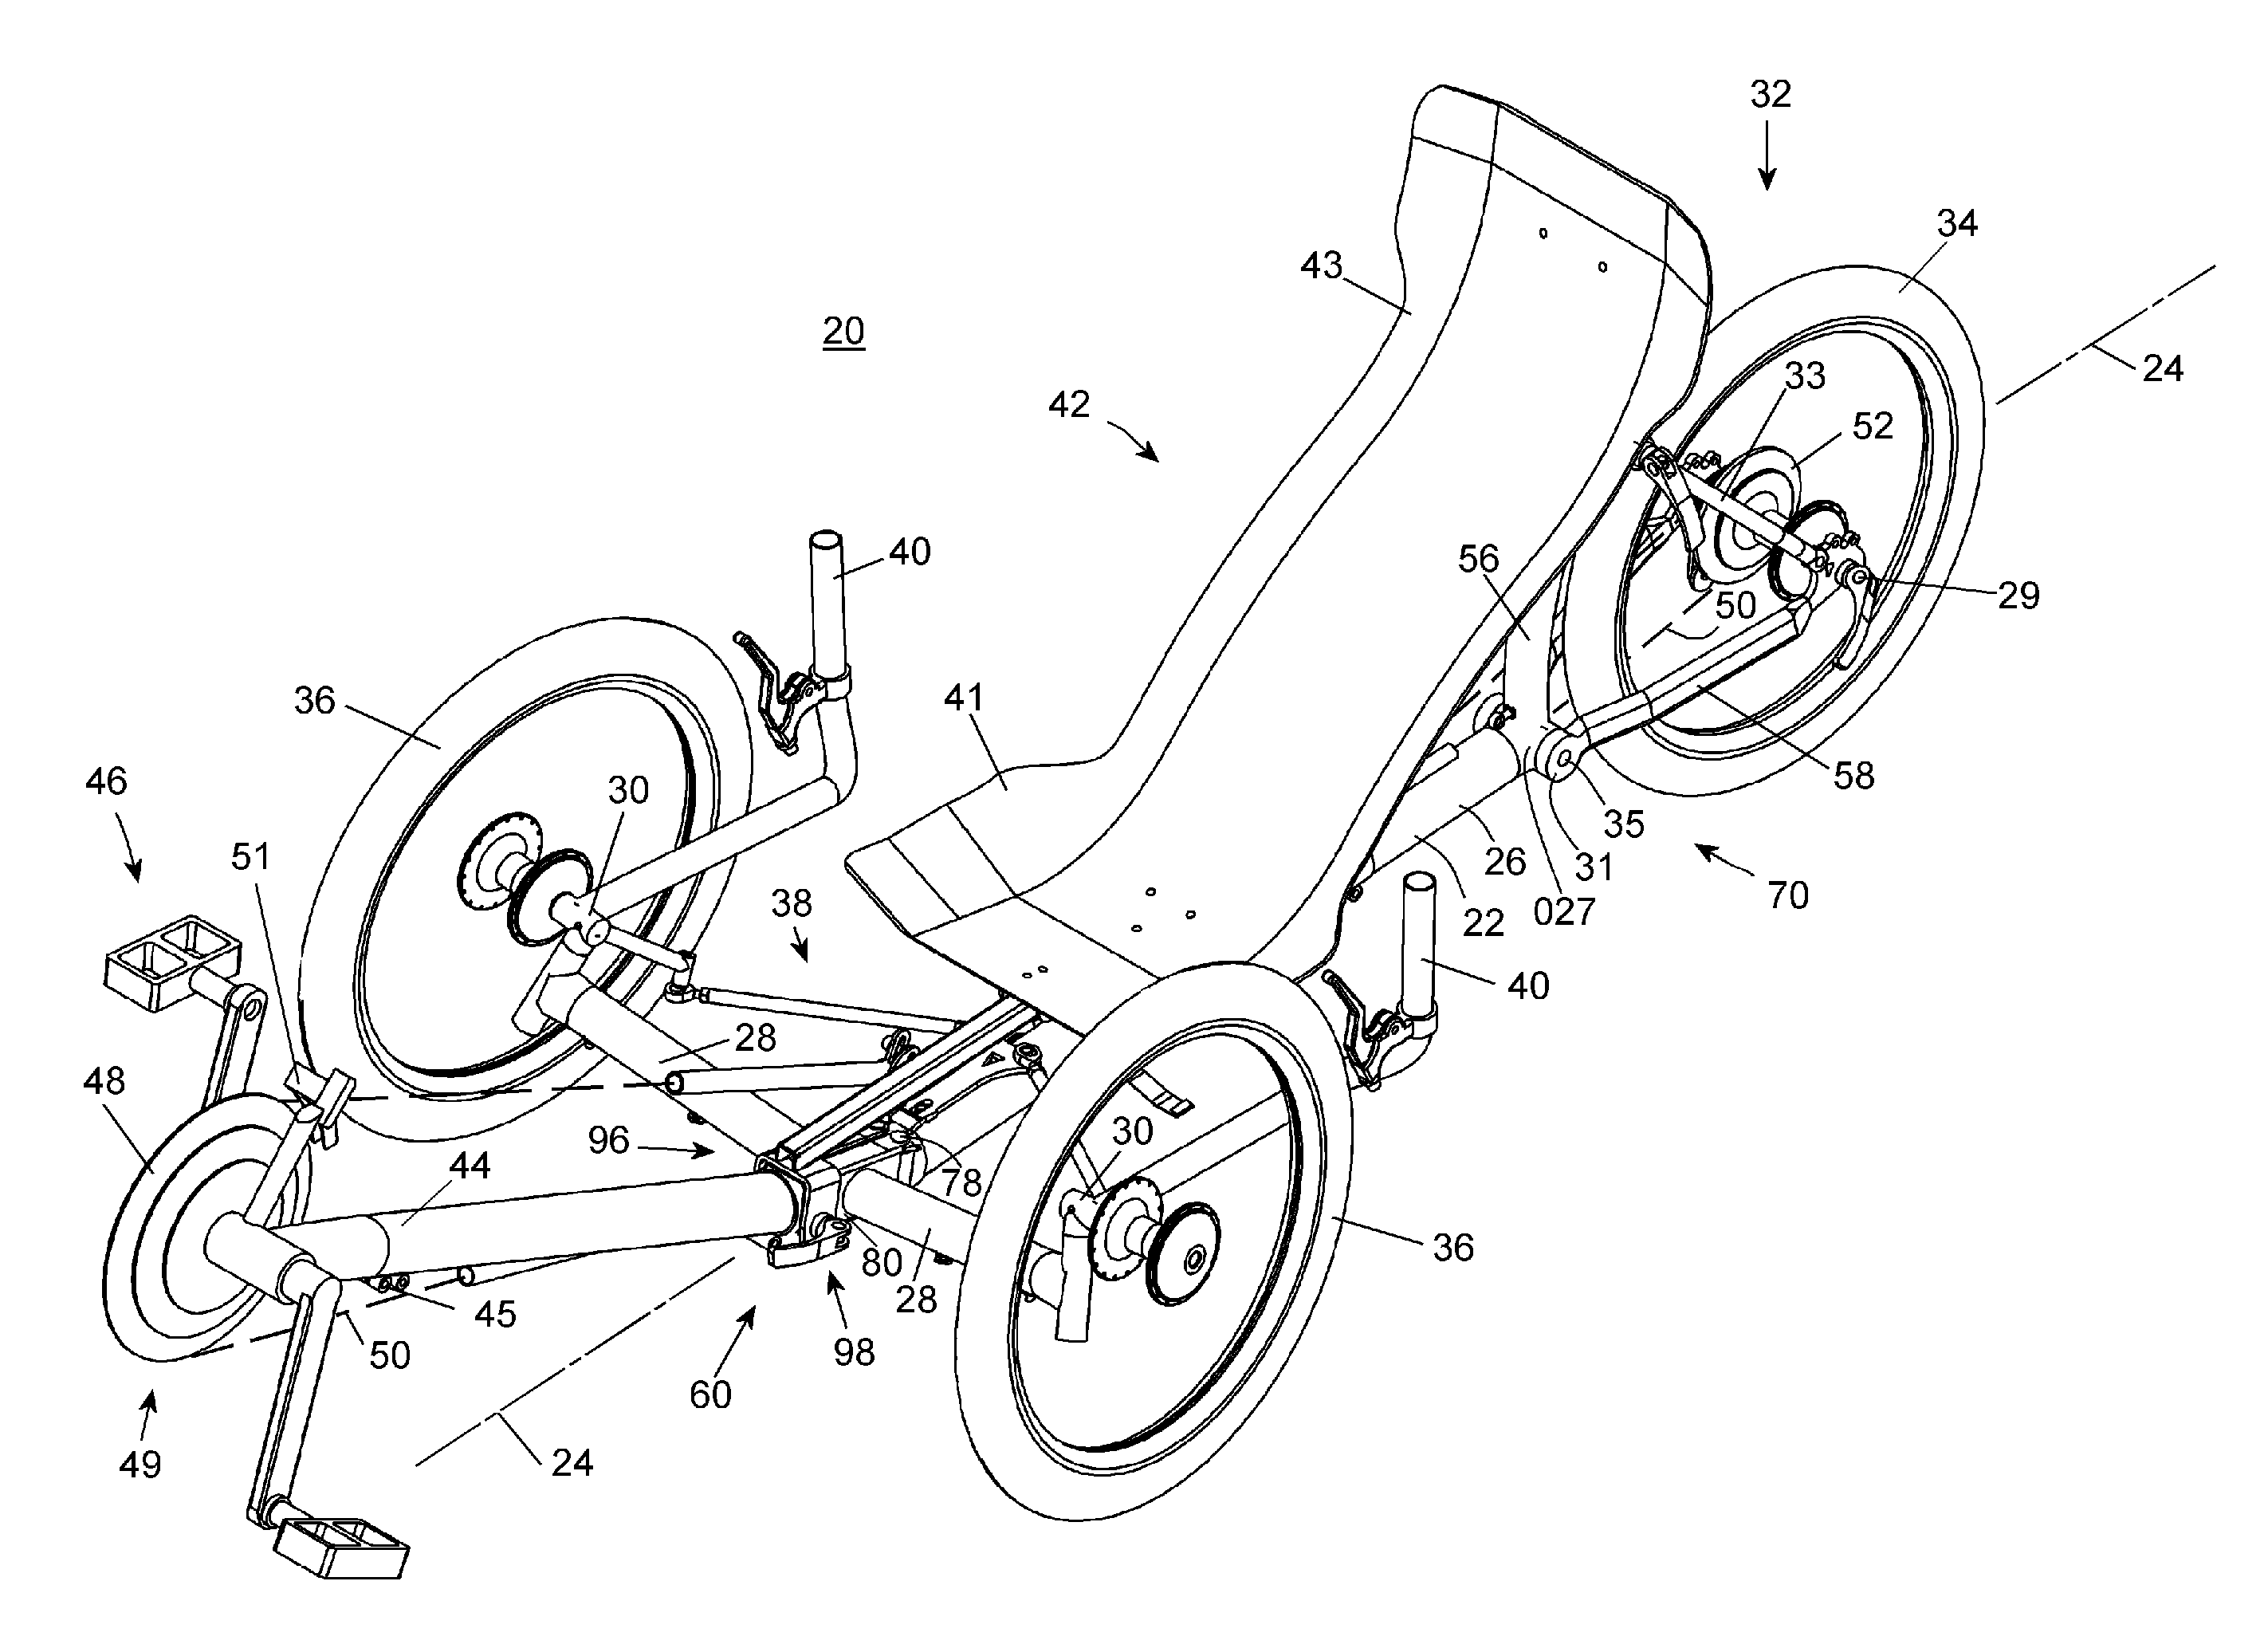 easy recumbent bike plan - Buscar con Google | Tri and